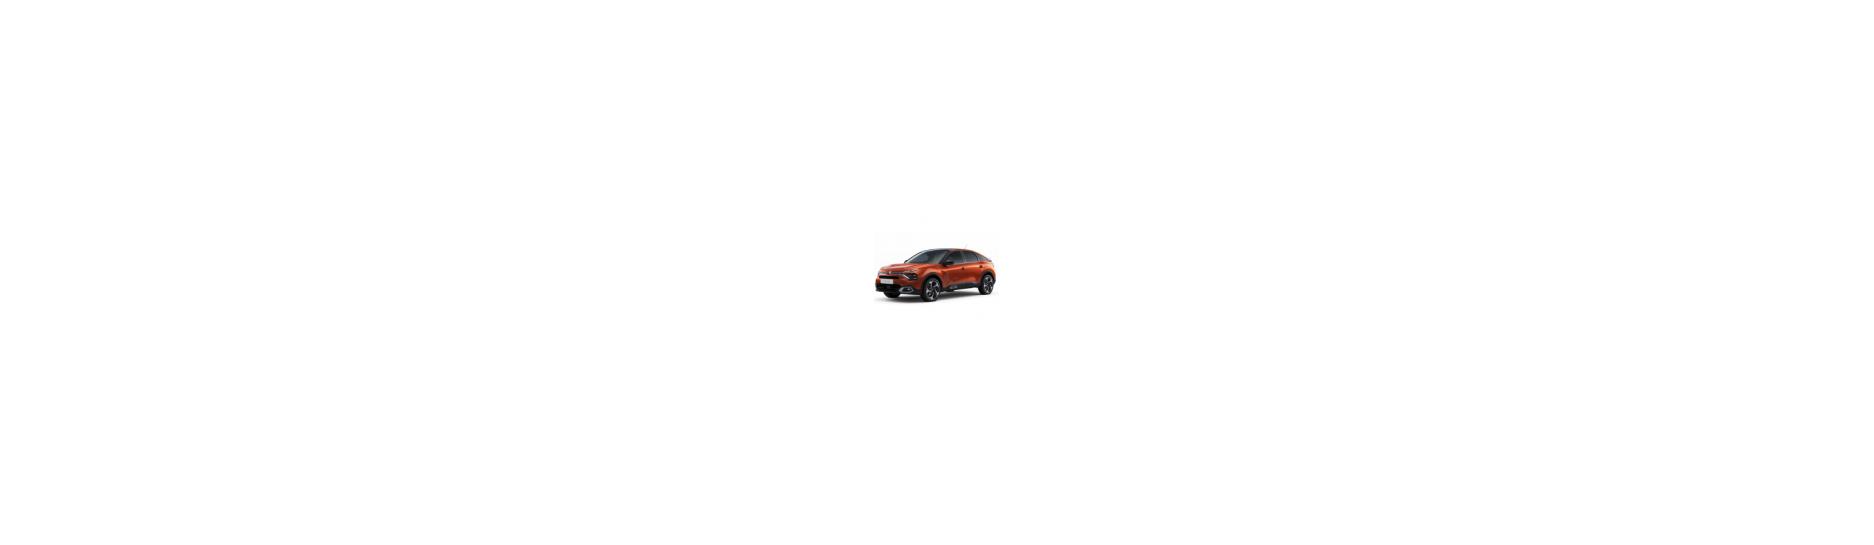 CHOOSE YOUR CAR